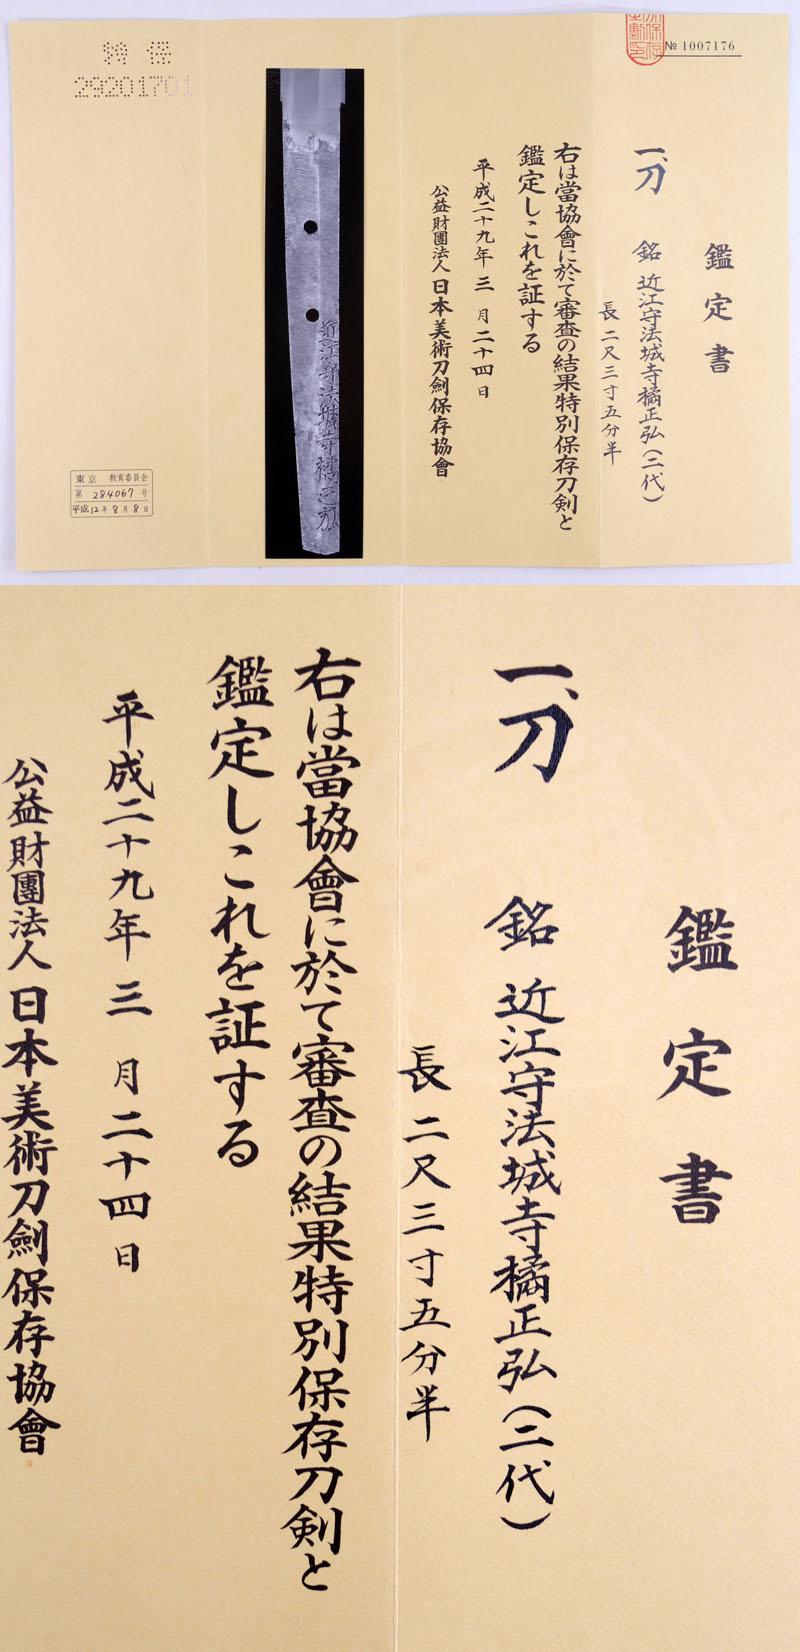 近江守法城寺橘正弘(二代) Picture of Certificate